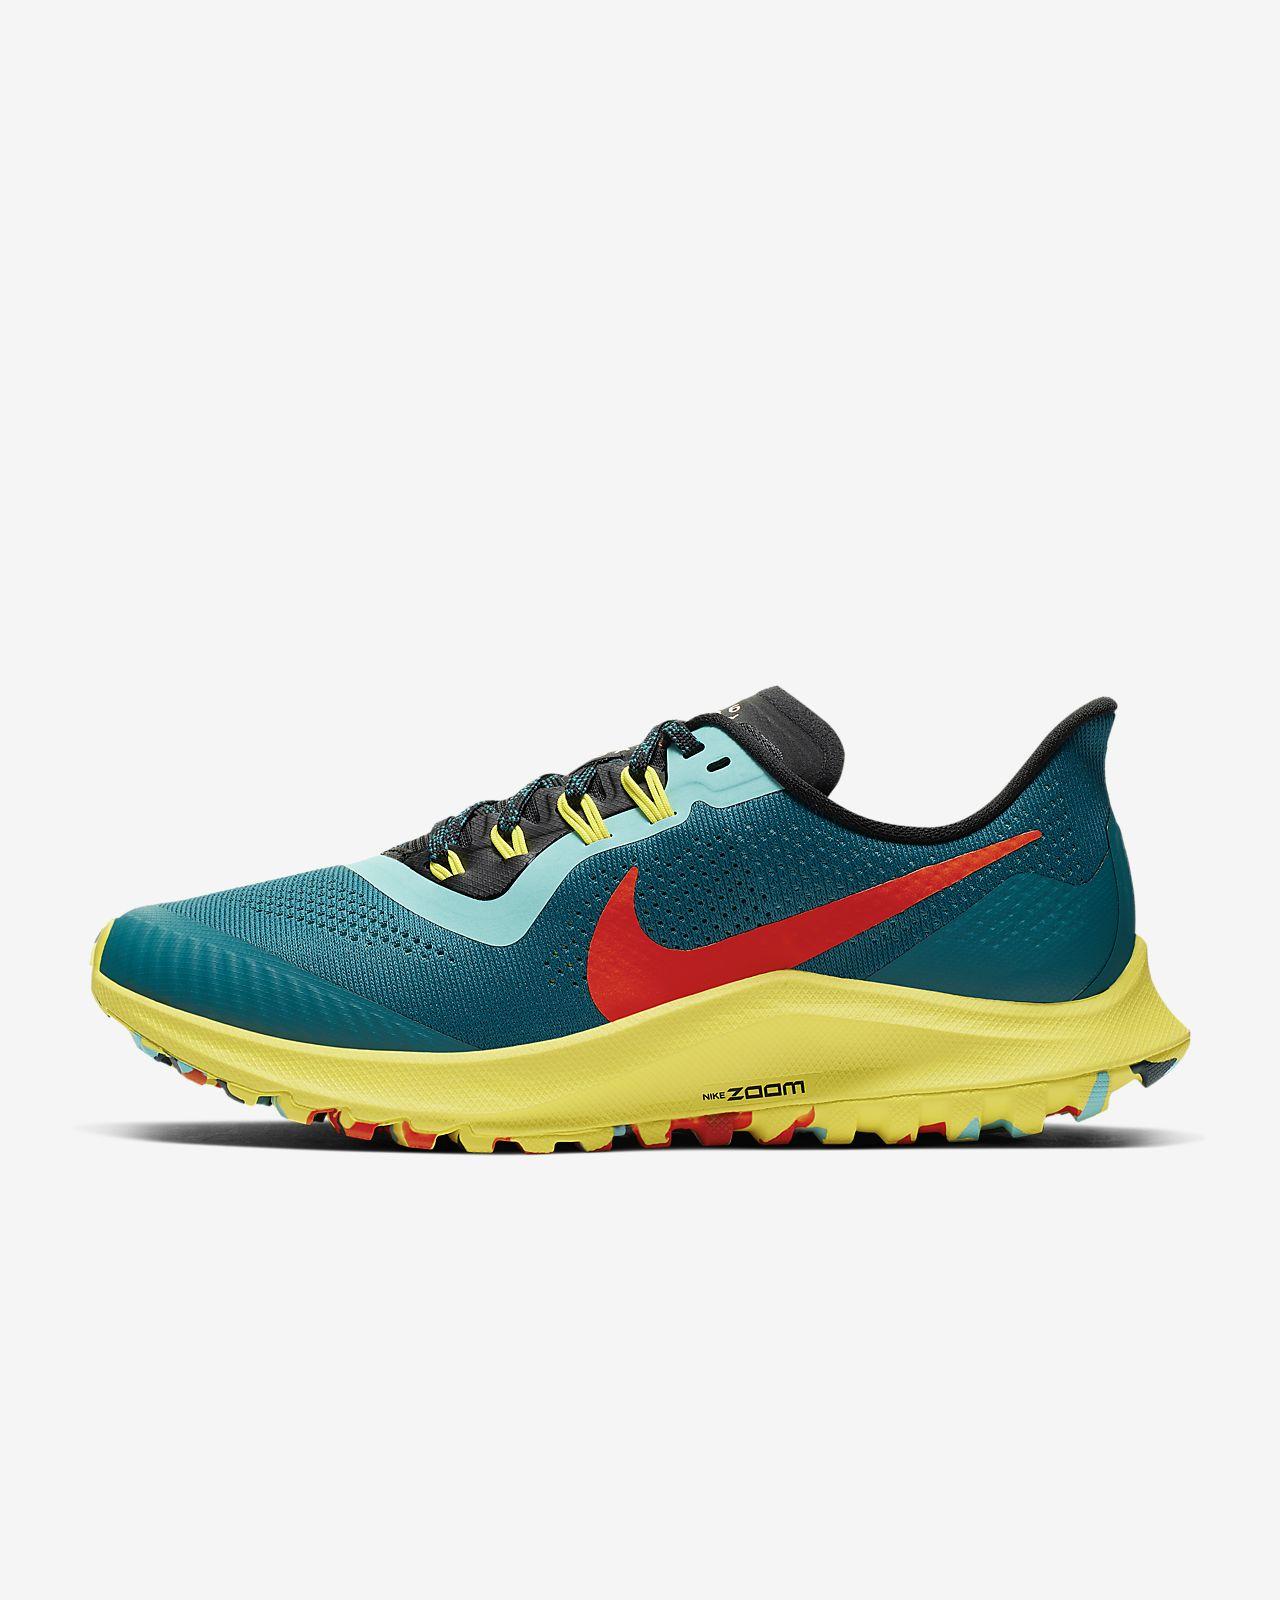 Sapatilhas de running para trilhos Nike Air Zoom Pegasus 36 Trail para mulher